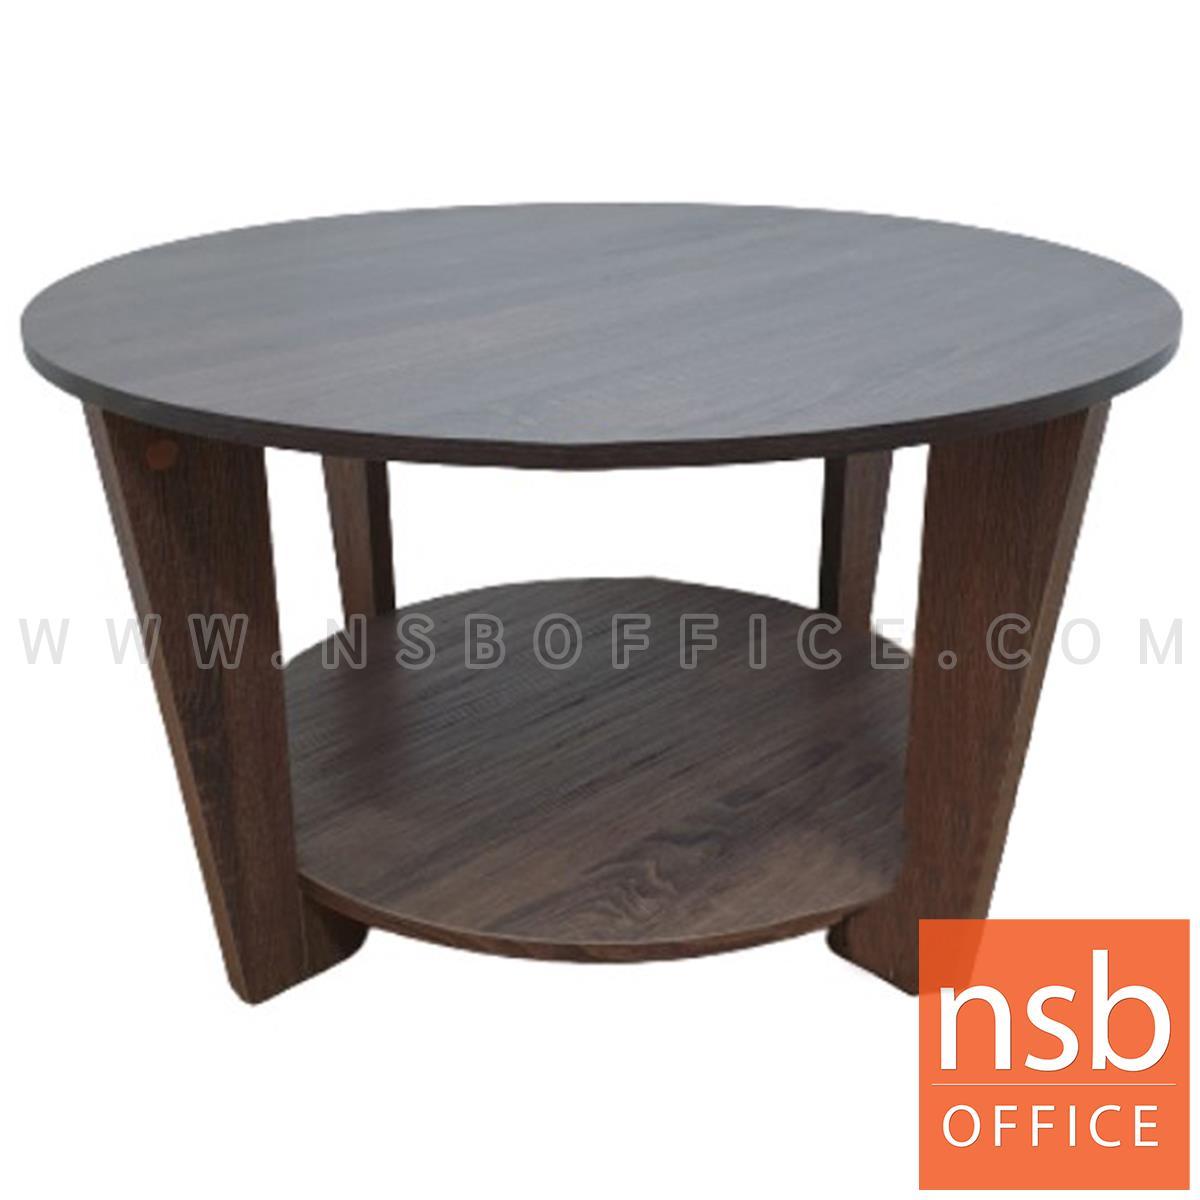 B13A300:โต๊ะกลางไม้ รุ่น Psylocke (ไซล็อค) ขนาด 80Di cm. โครงไม้